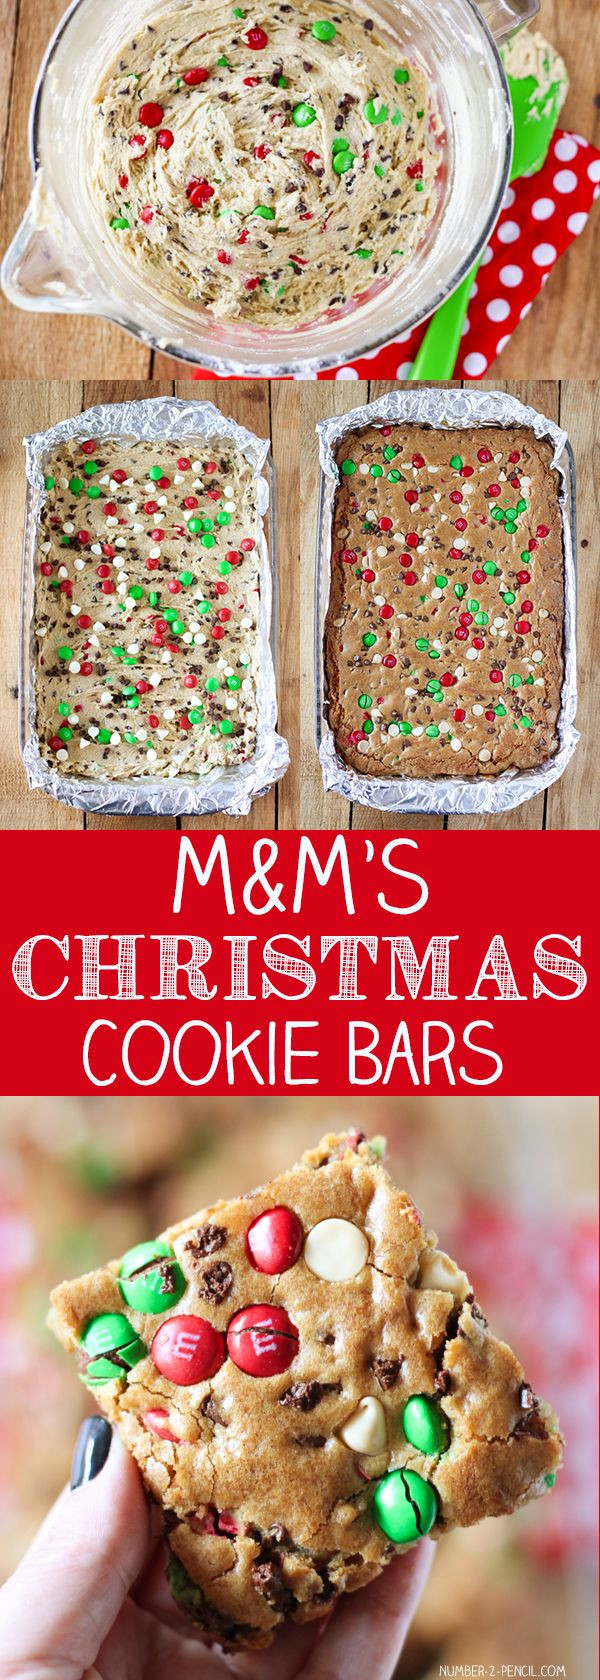 Christmas Baking Goods Recipes  1000 ideas about Christmas Treats on Pinterest